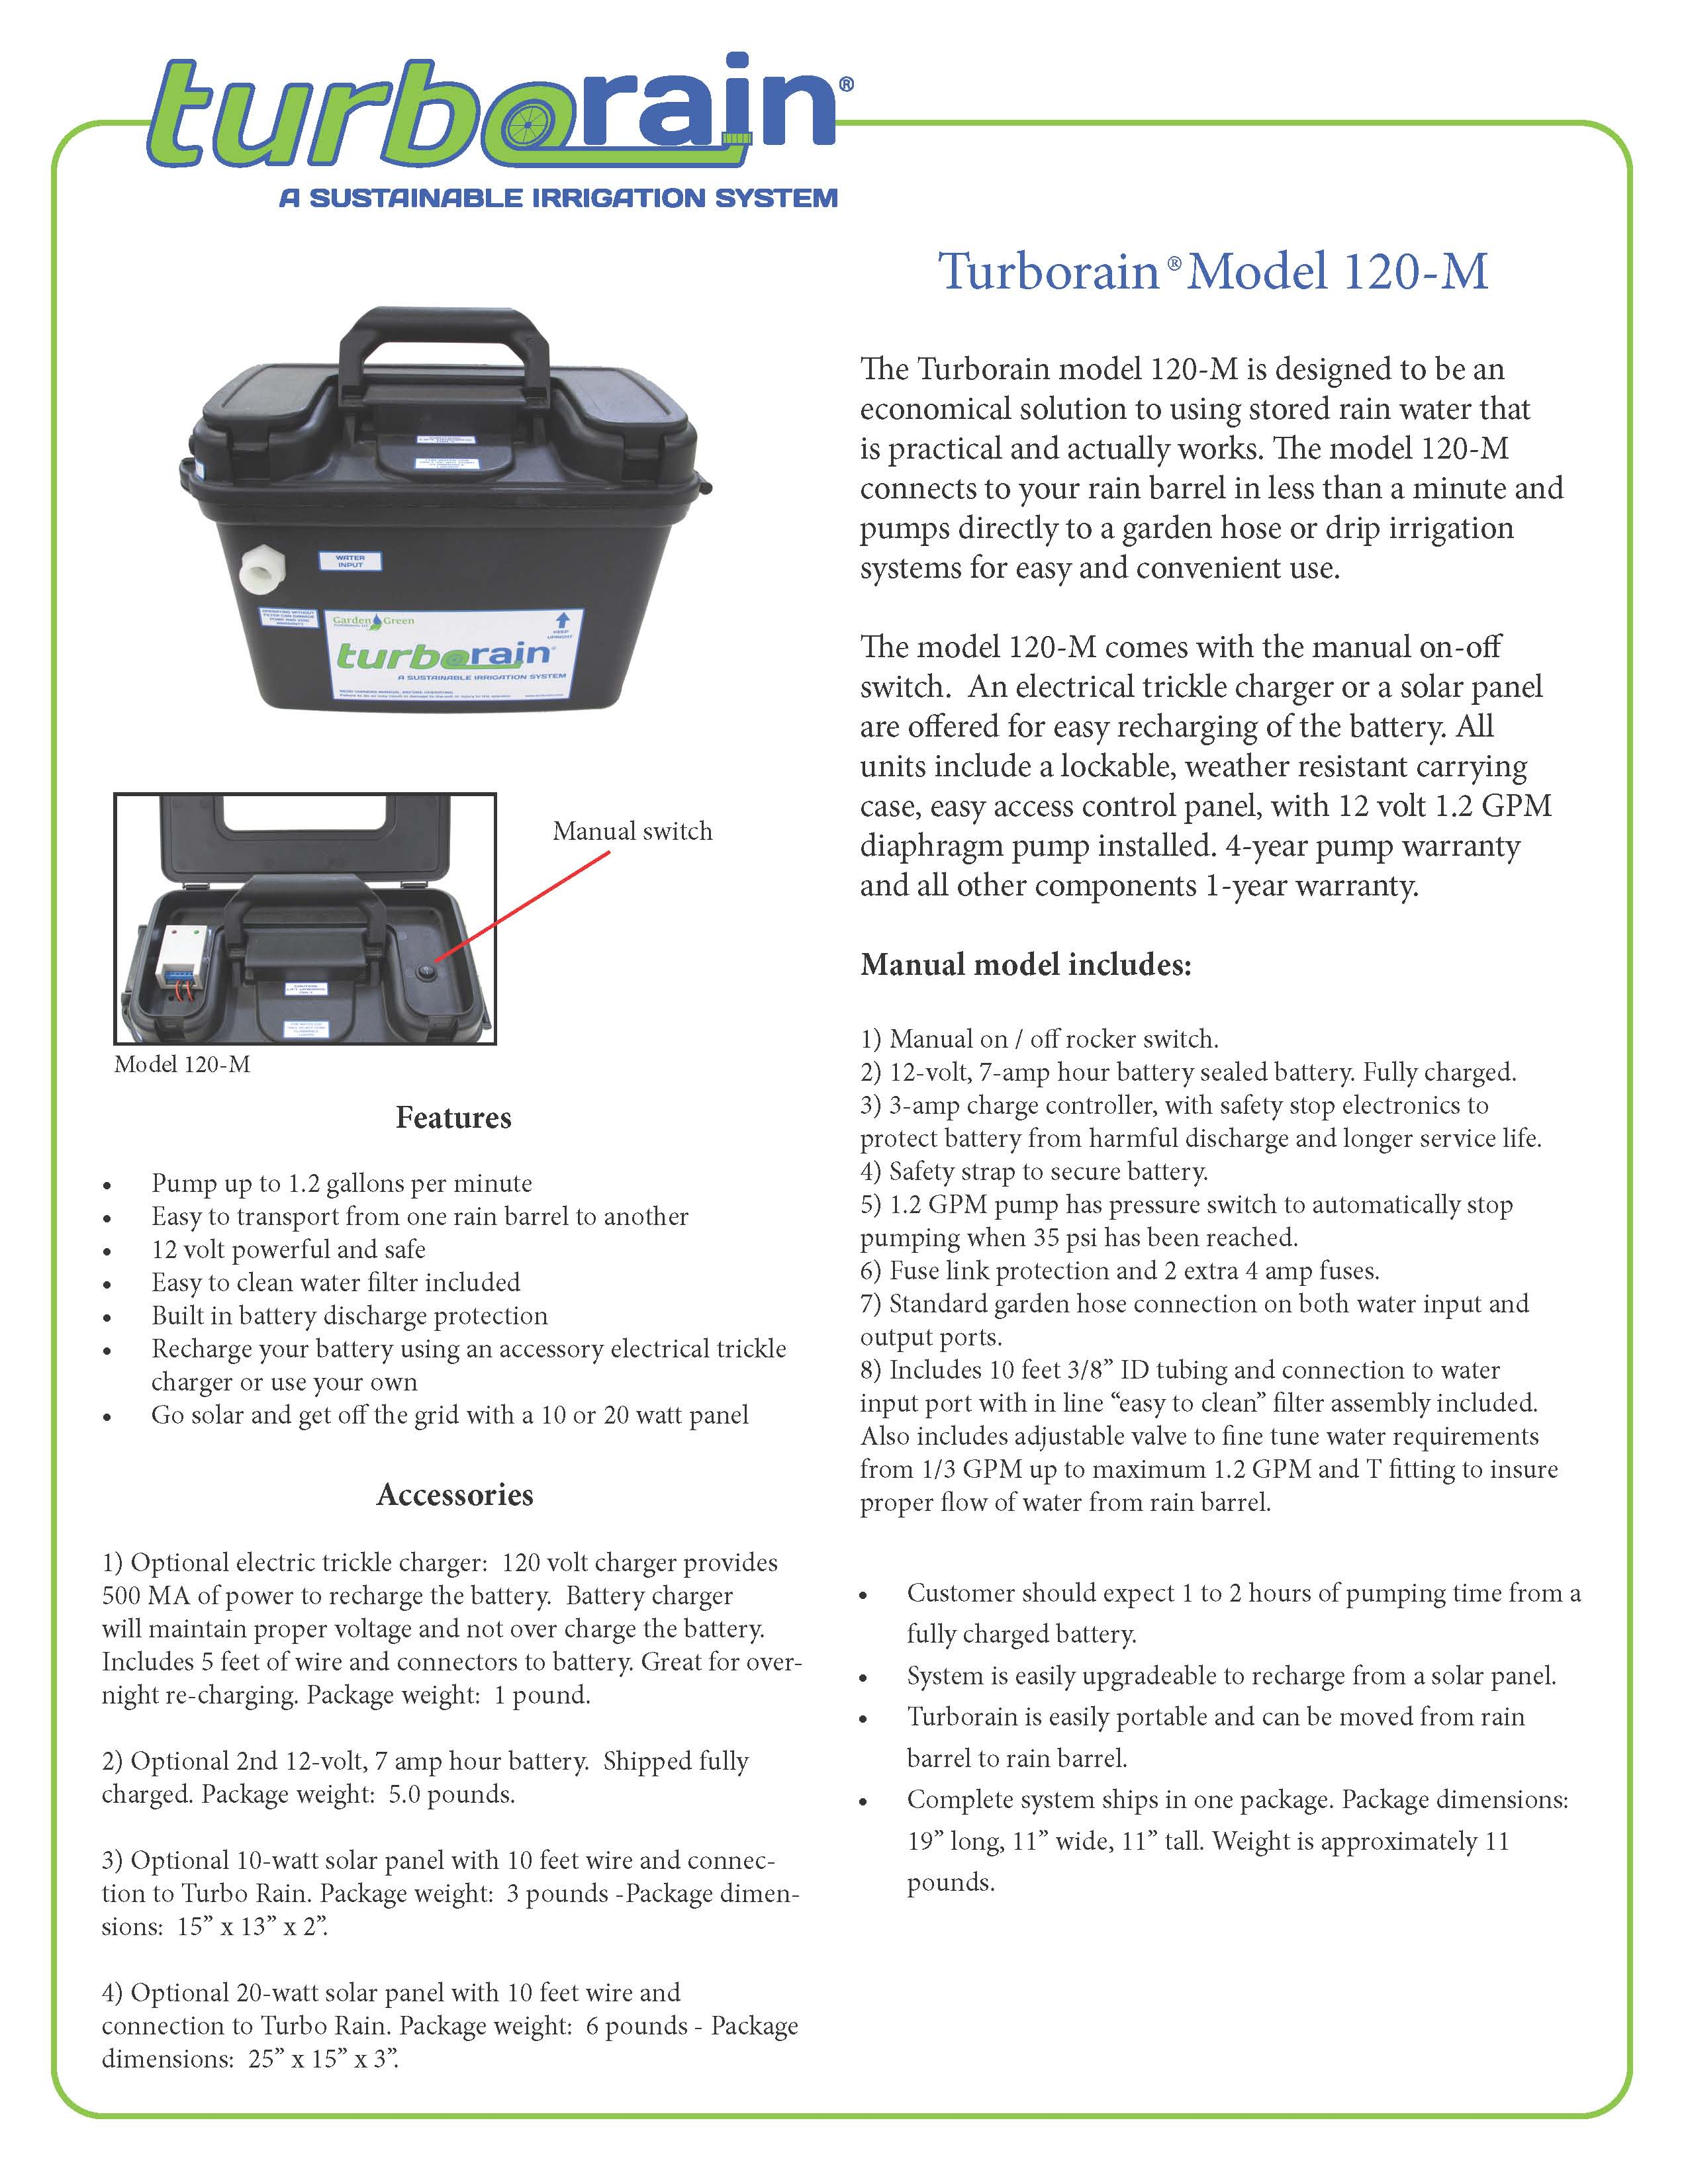 TurboRain, Manual, 1 2 gallon per minute [abpWPTRS120m